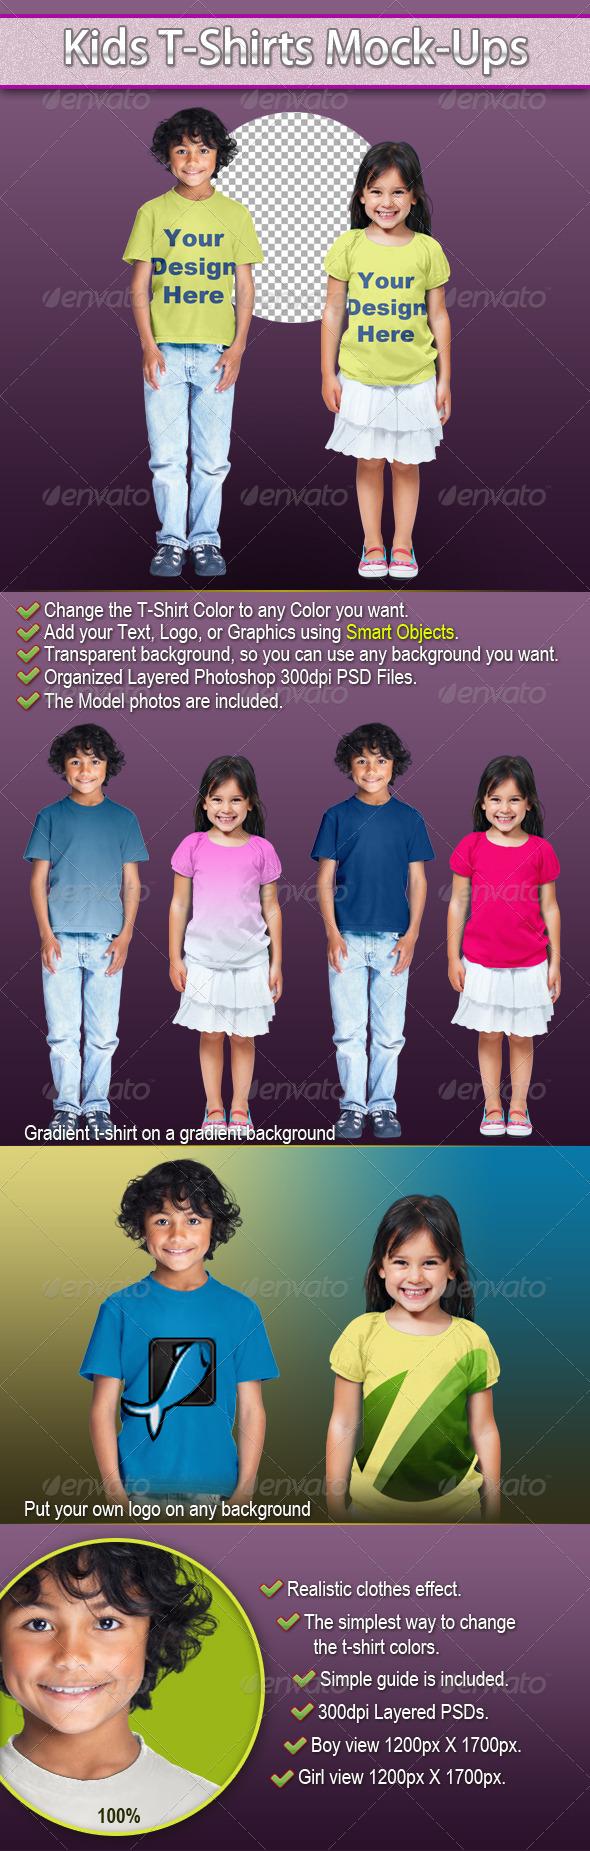 Kids T-Shirts Mock-Ups